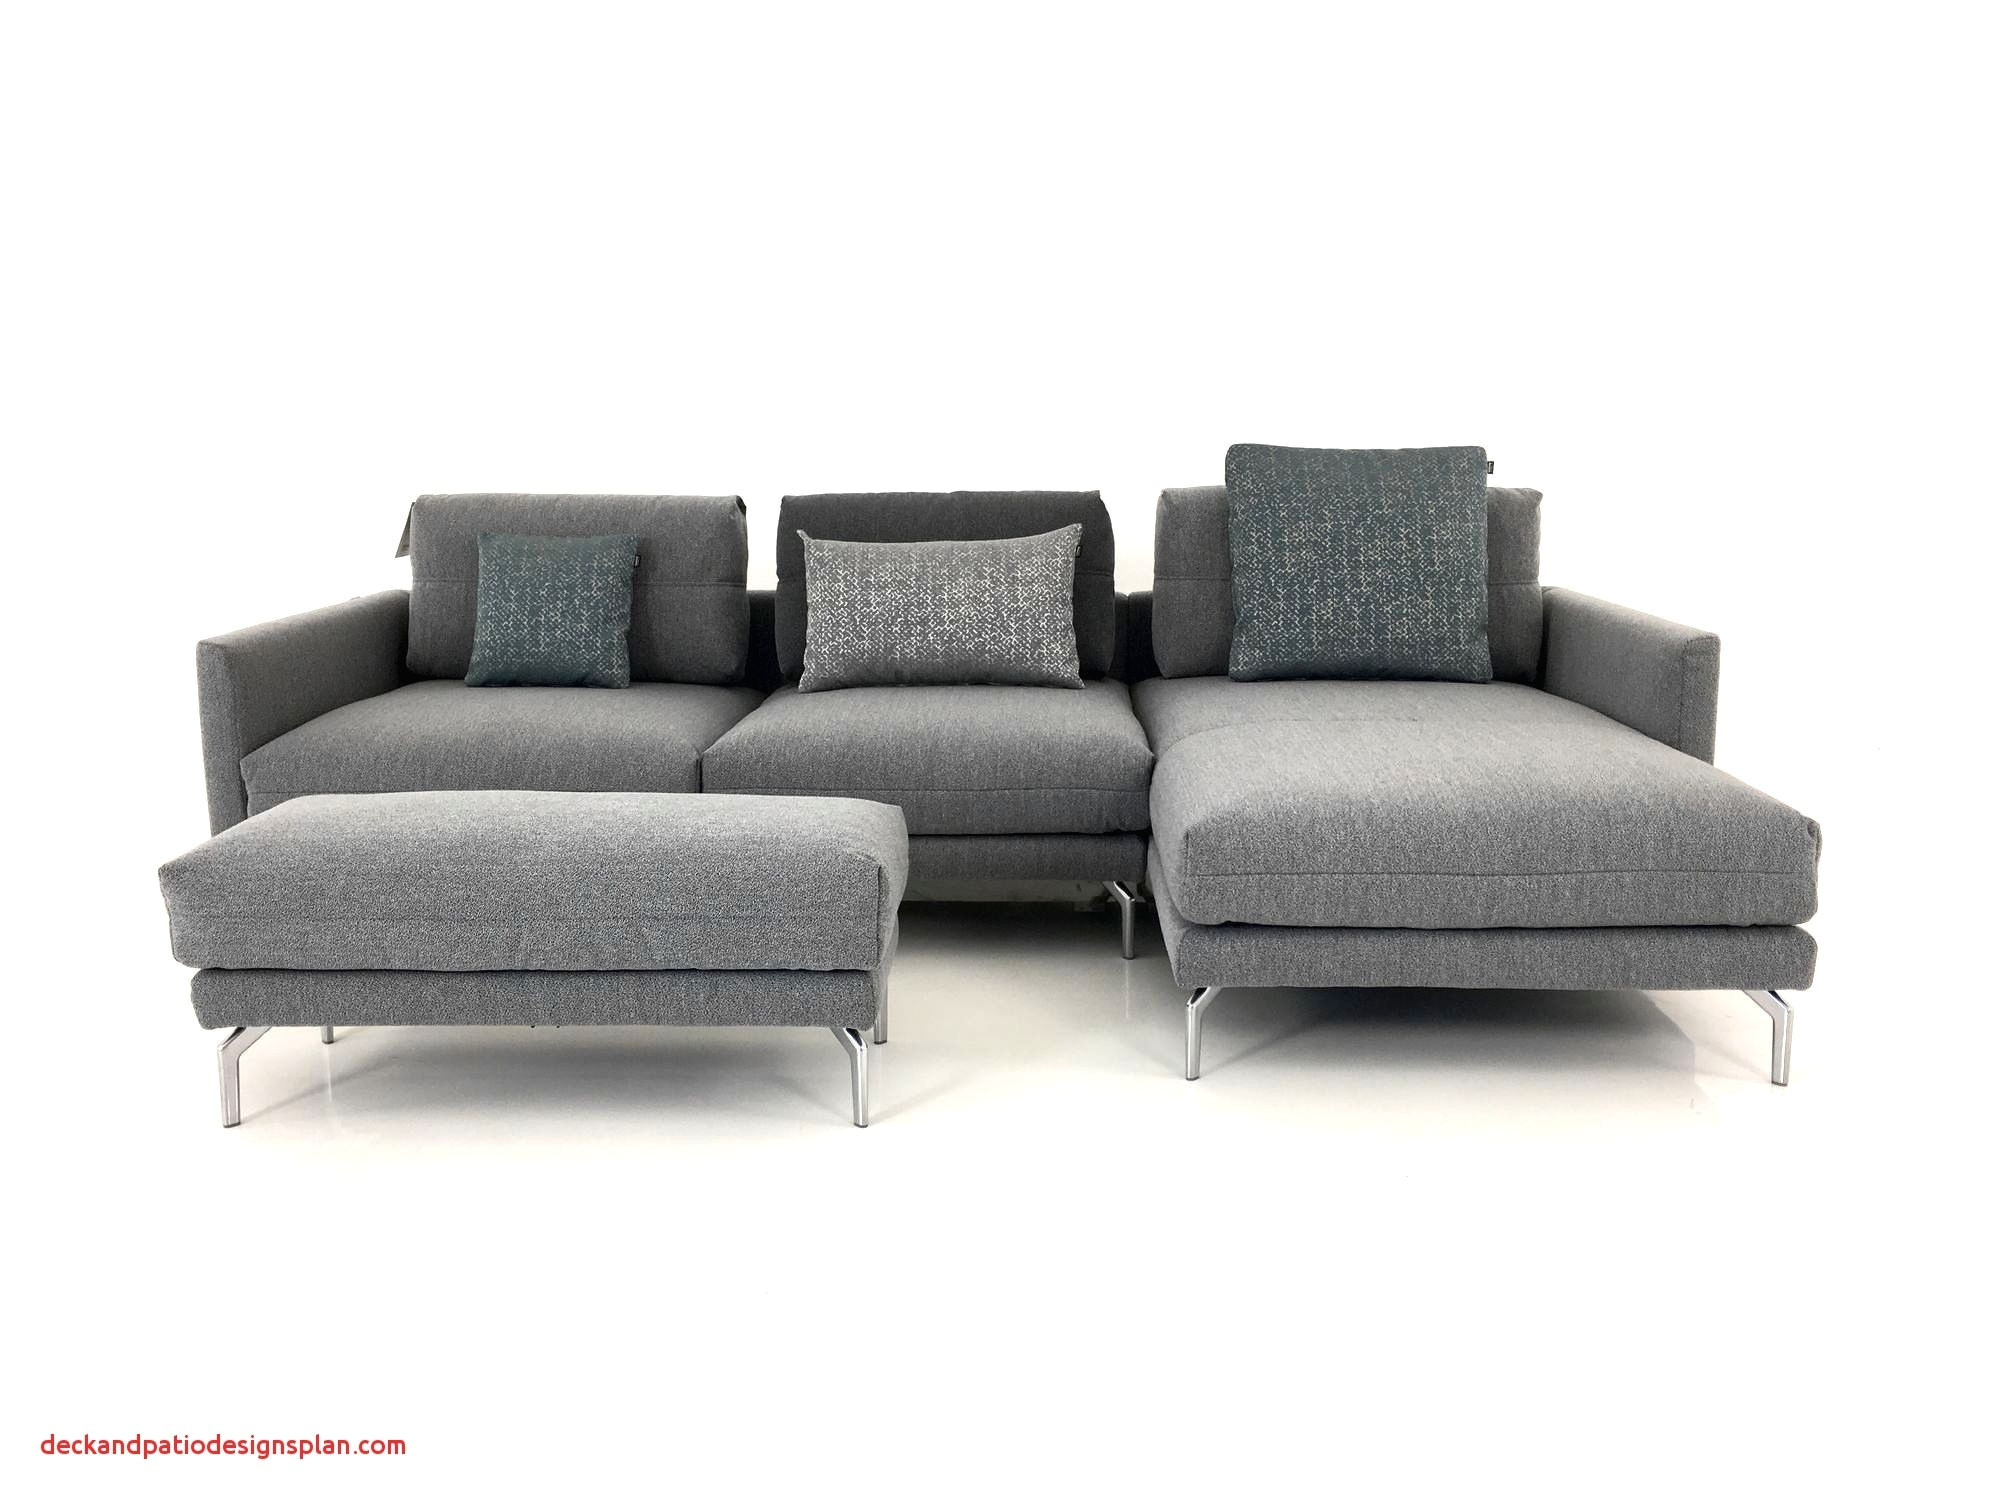 klappcouch ikea beste couch recamiere neu sofa grau ikea luft sofa ikea luxus bmw x3 2